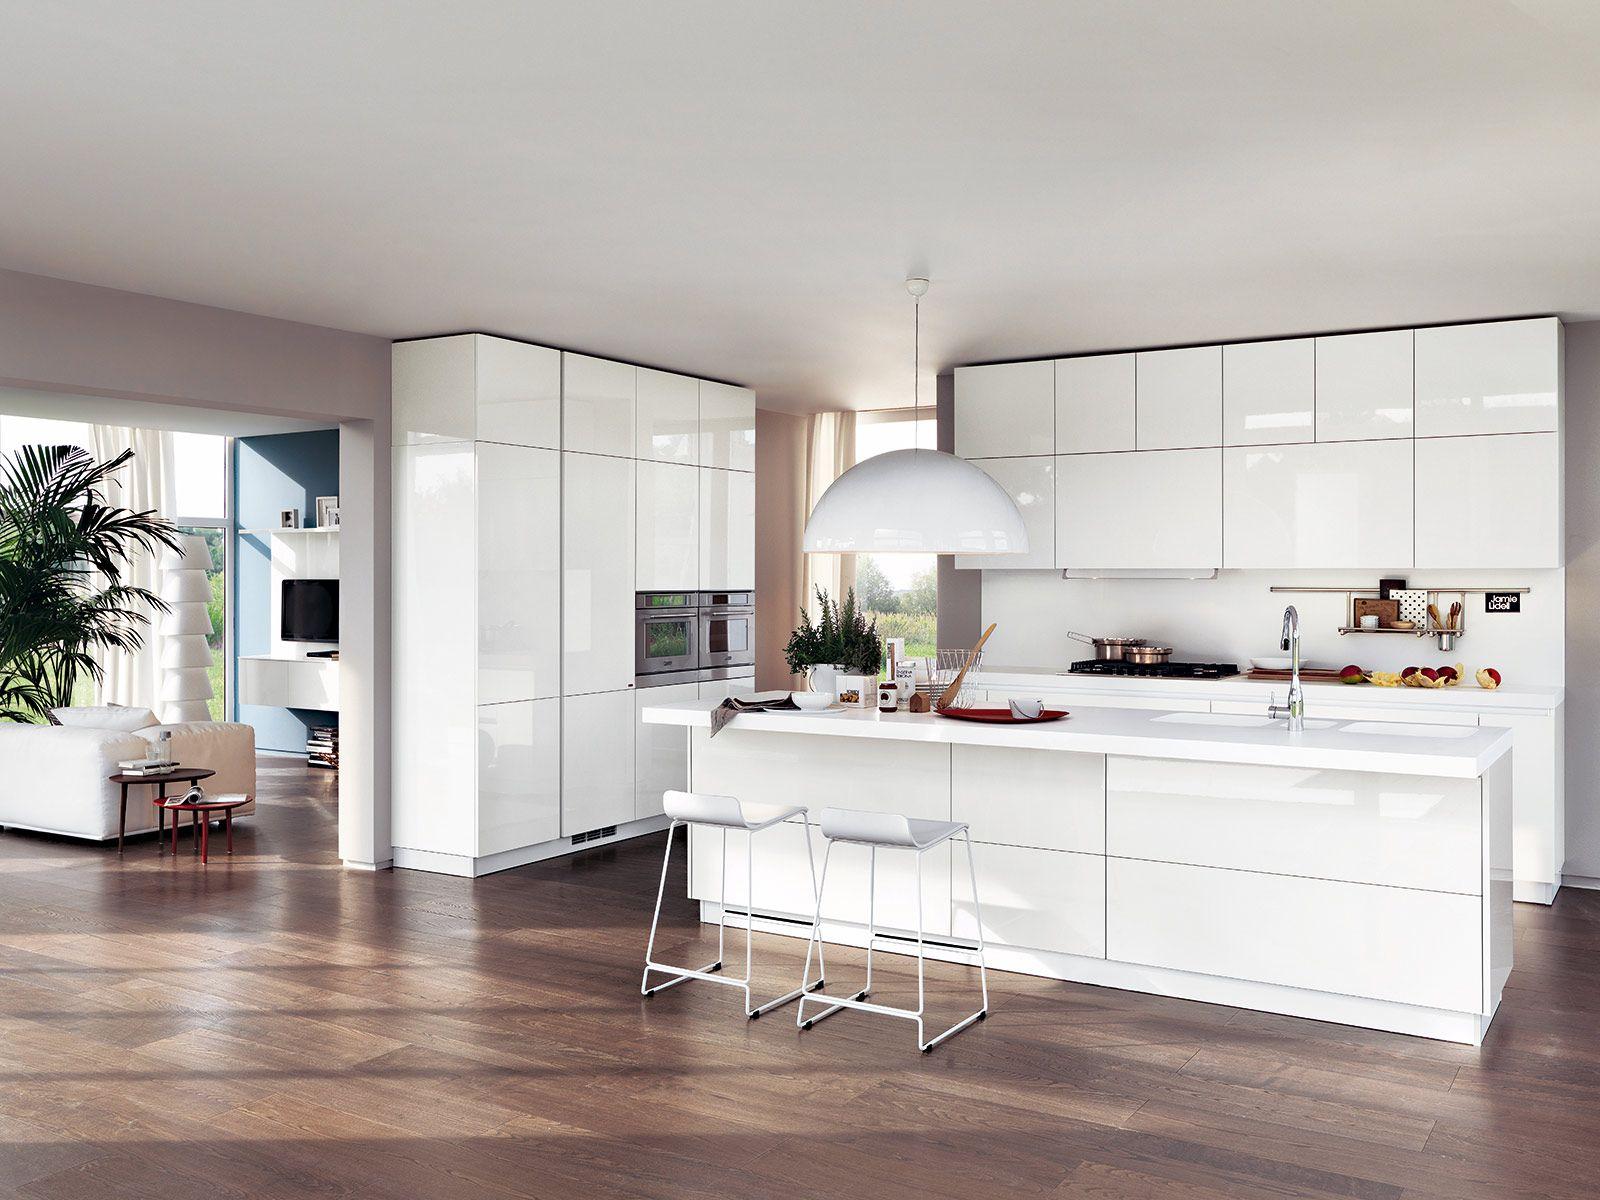 cucina bianca - Поиск в Google | kitchen | Pinterest | Cucina ...